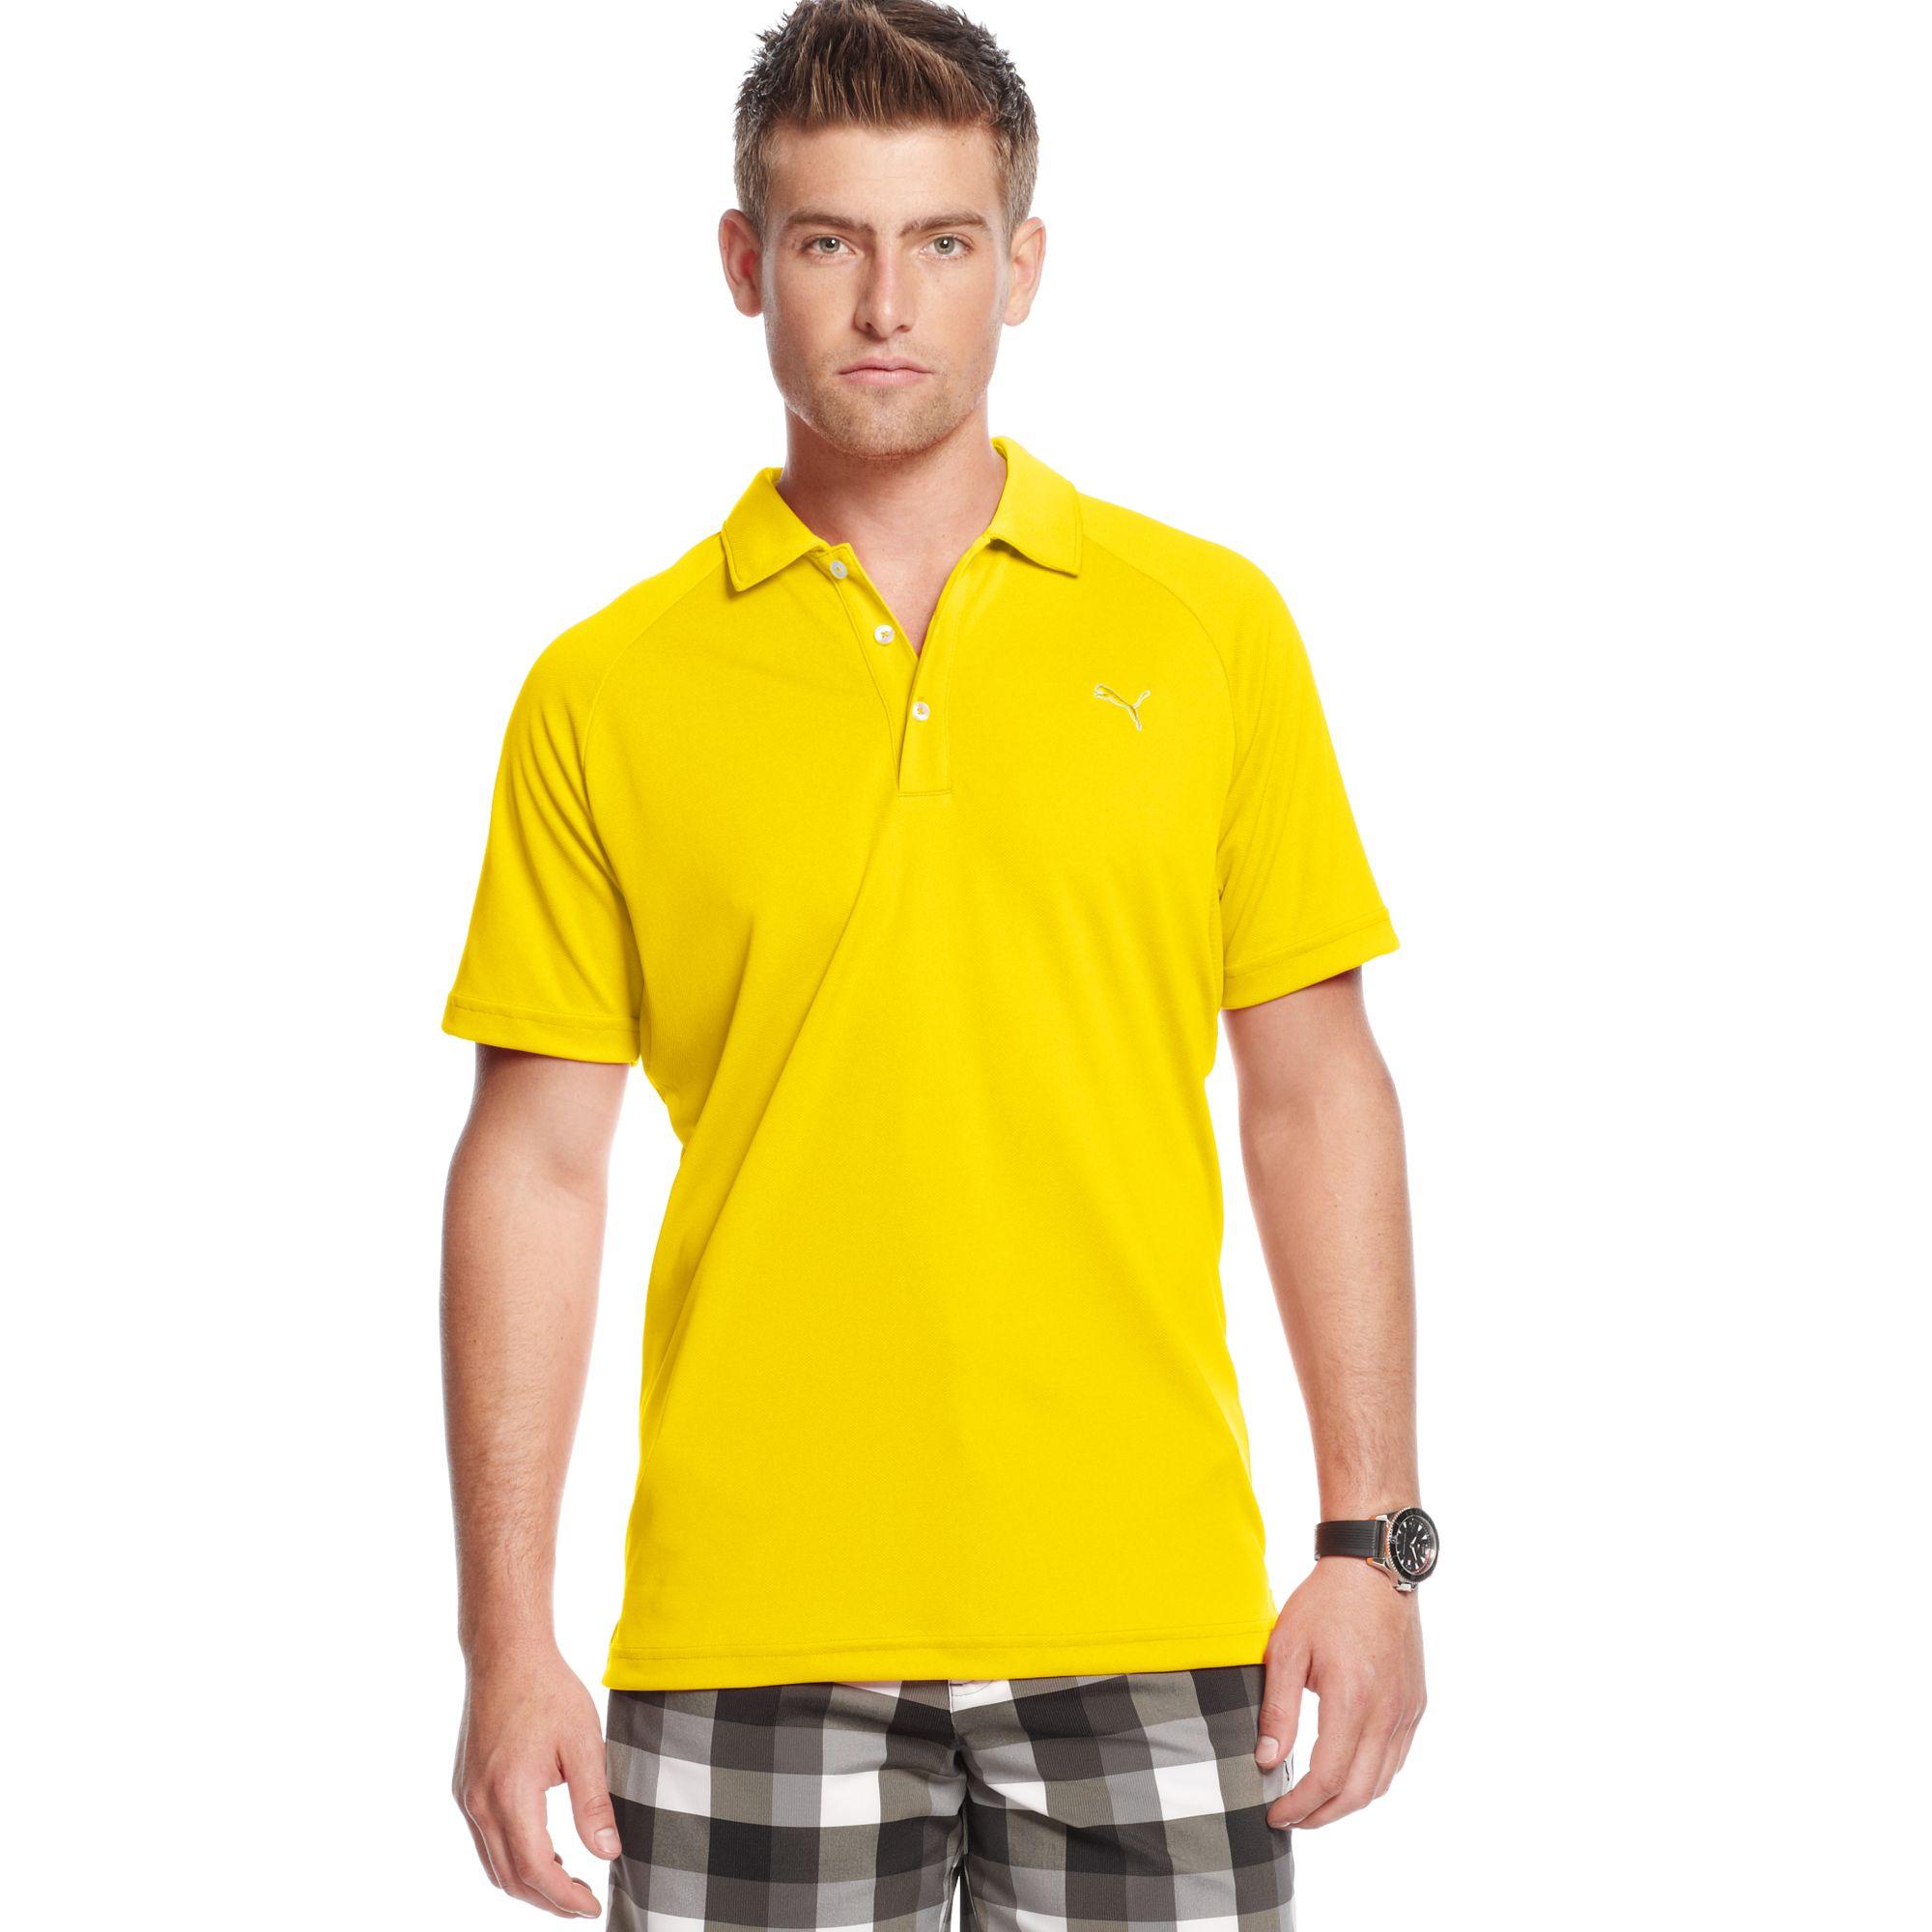 Puma Raglan Tech Performance Golf Polo Shirt In Yellow For